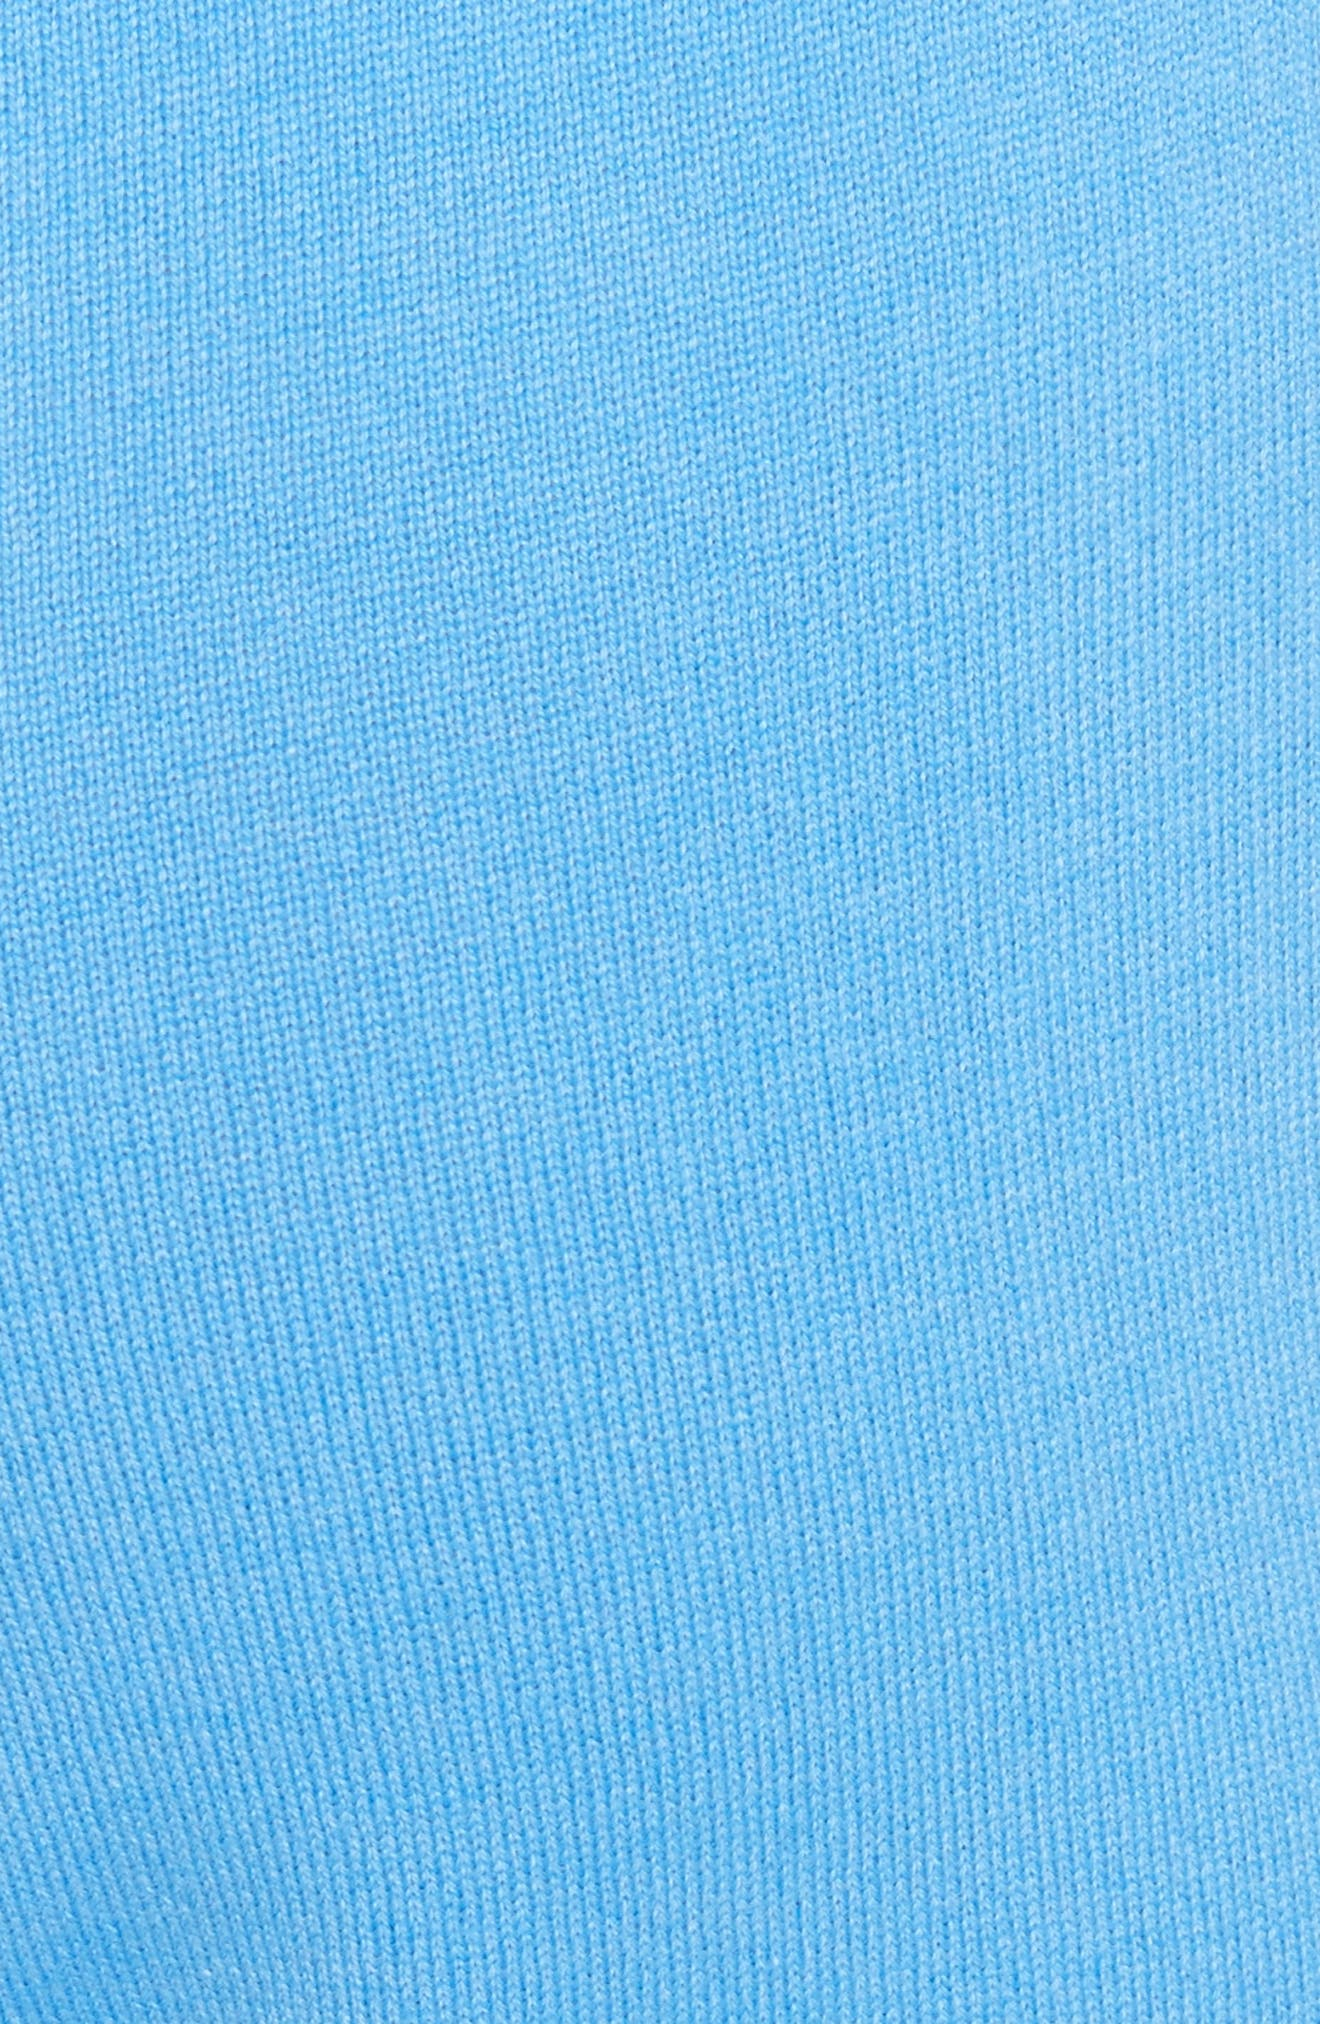 Cashmere Jersey Pants,                             Alternate thumbnail 5, color,                             Bright Niagara